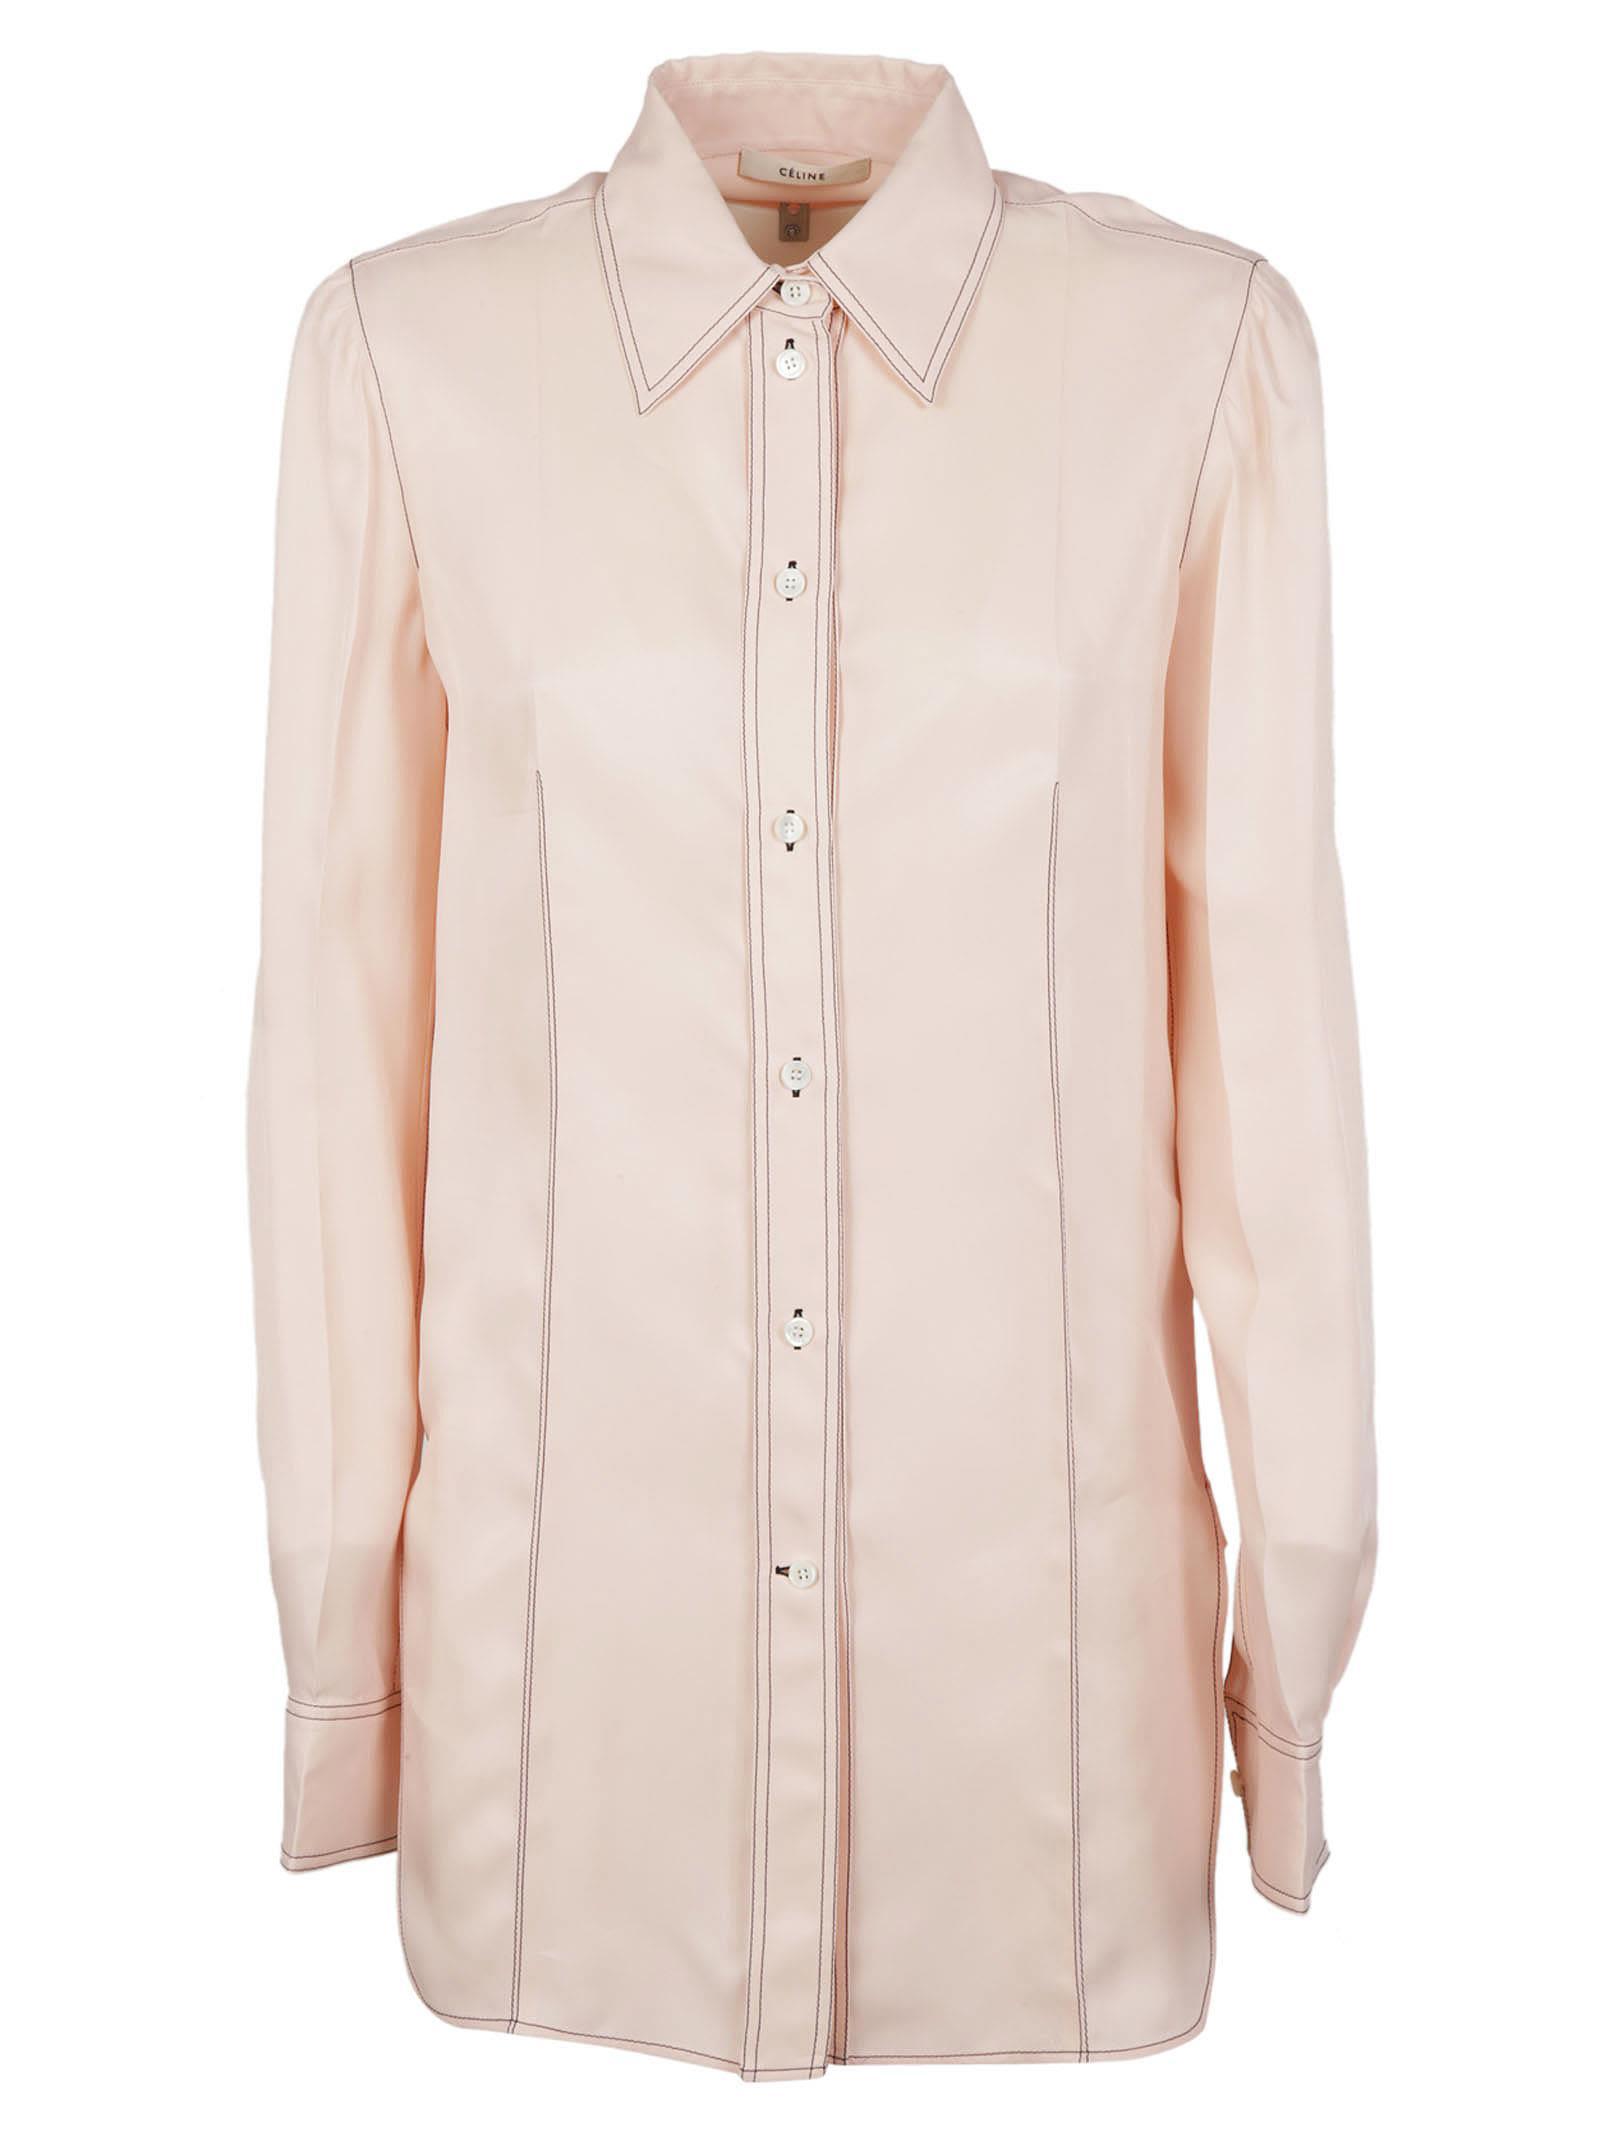 Celine Plain Shirt